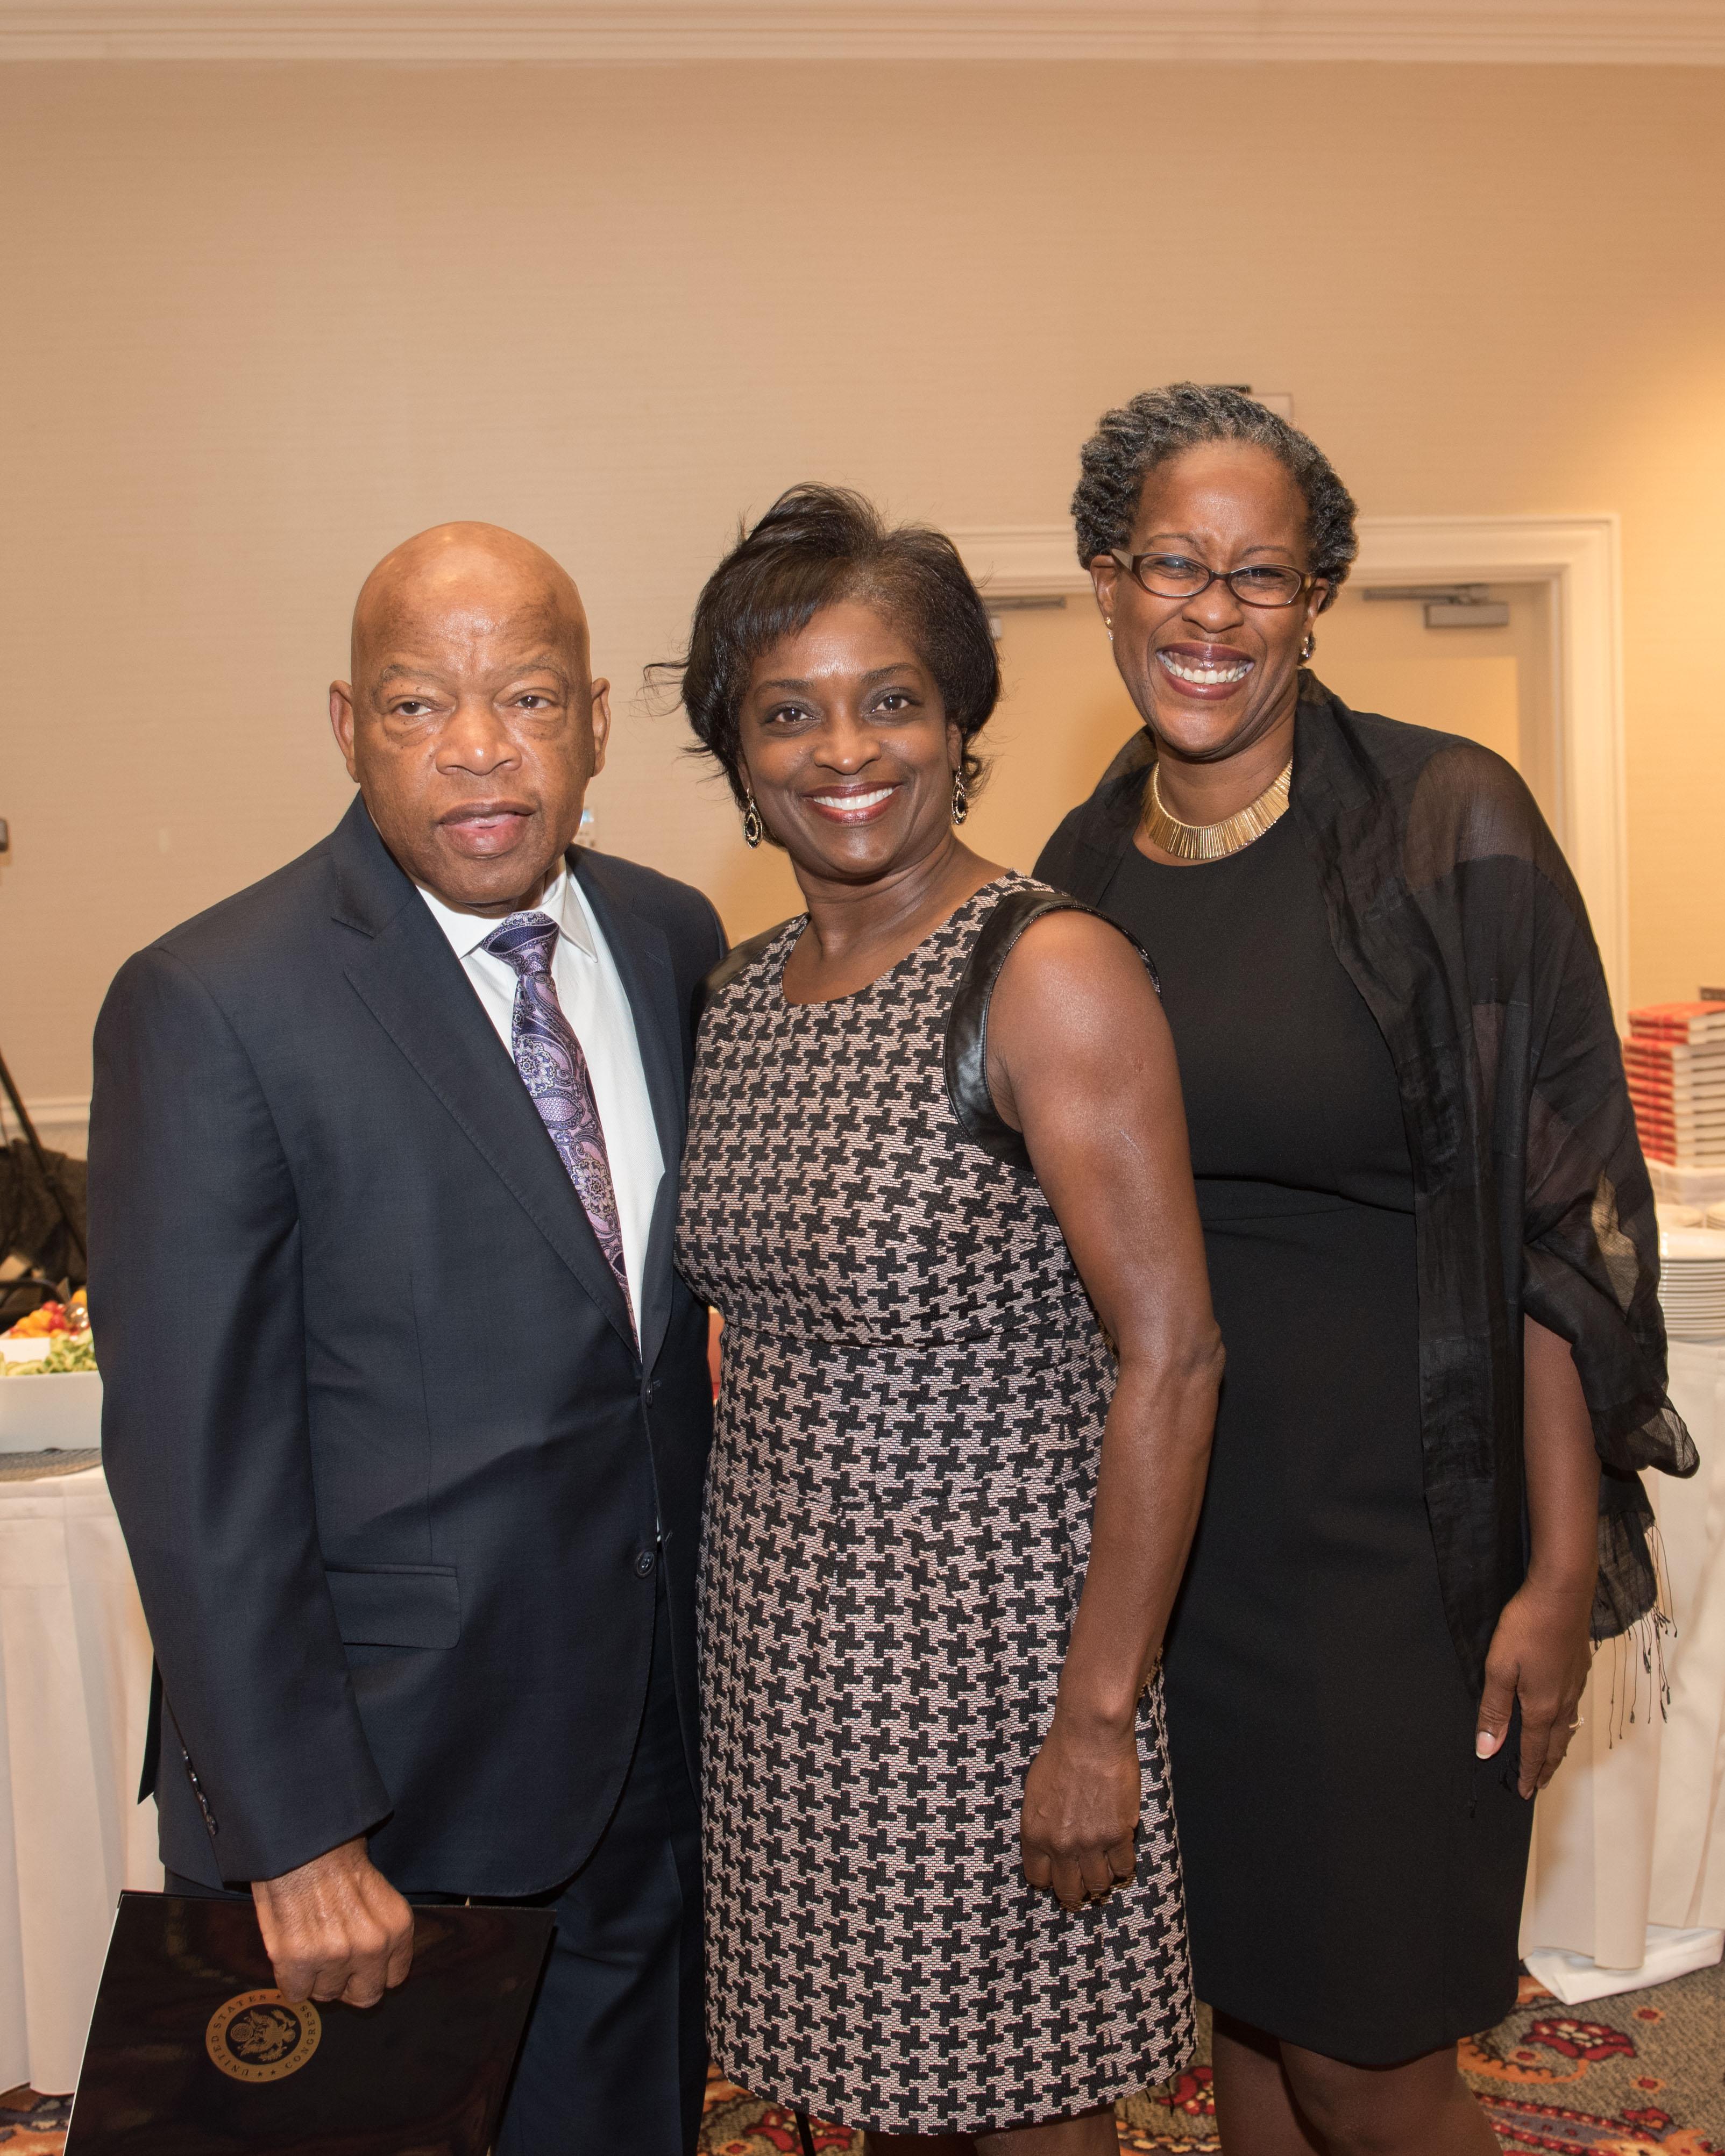 Congressman John Lewis, Mignon Clyburne and Audrey Hipkins